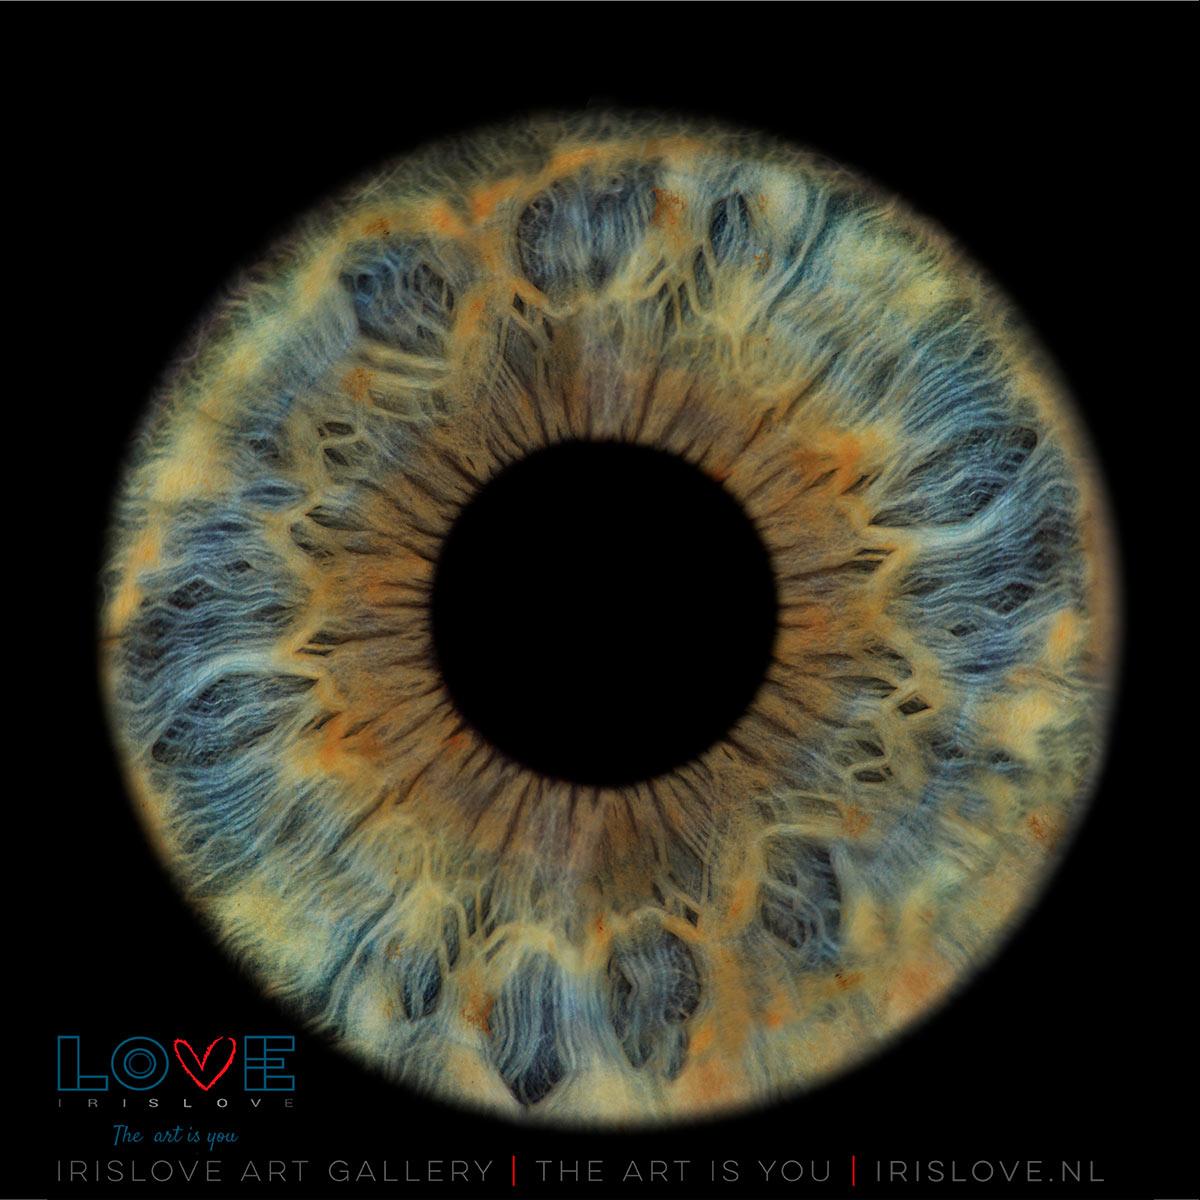 Kunstwerk van oog